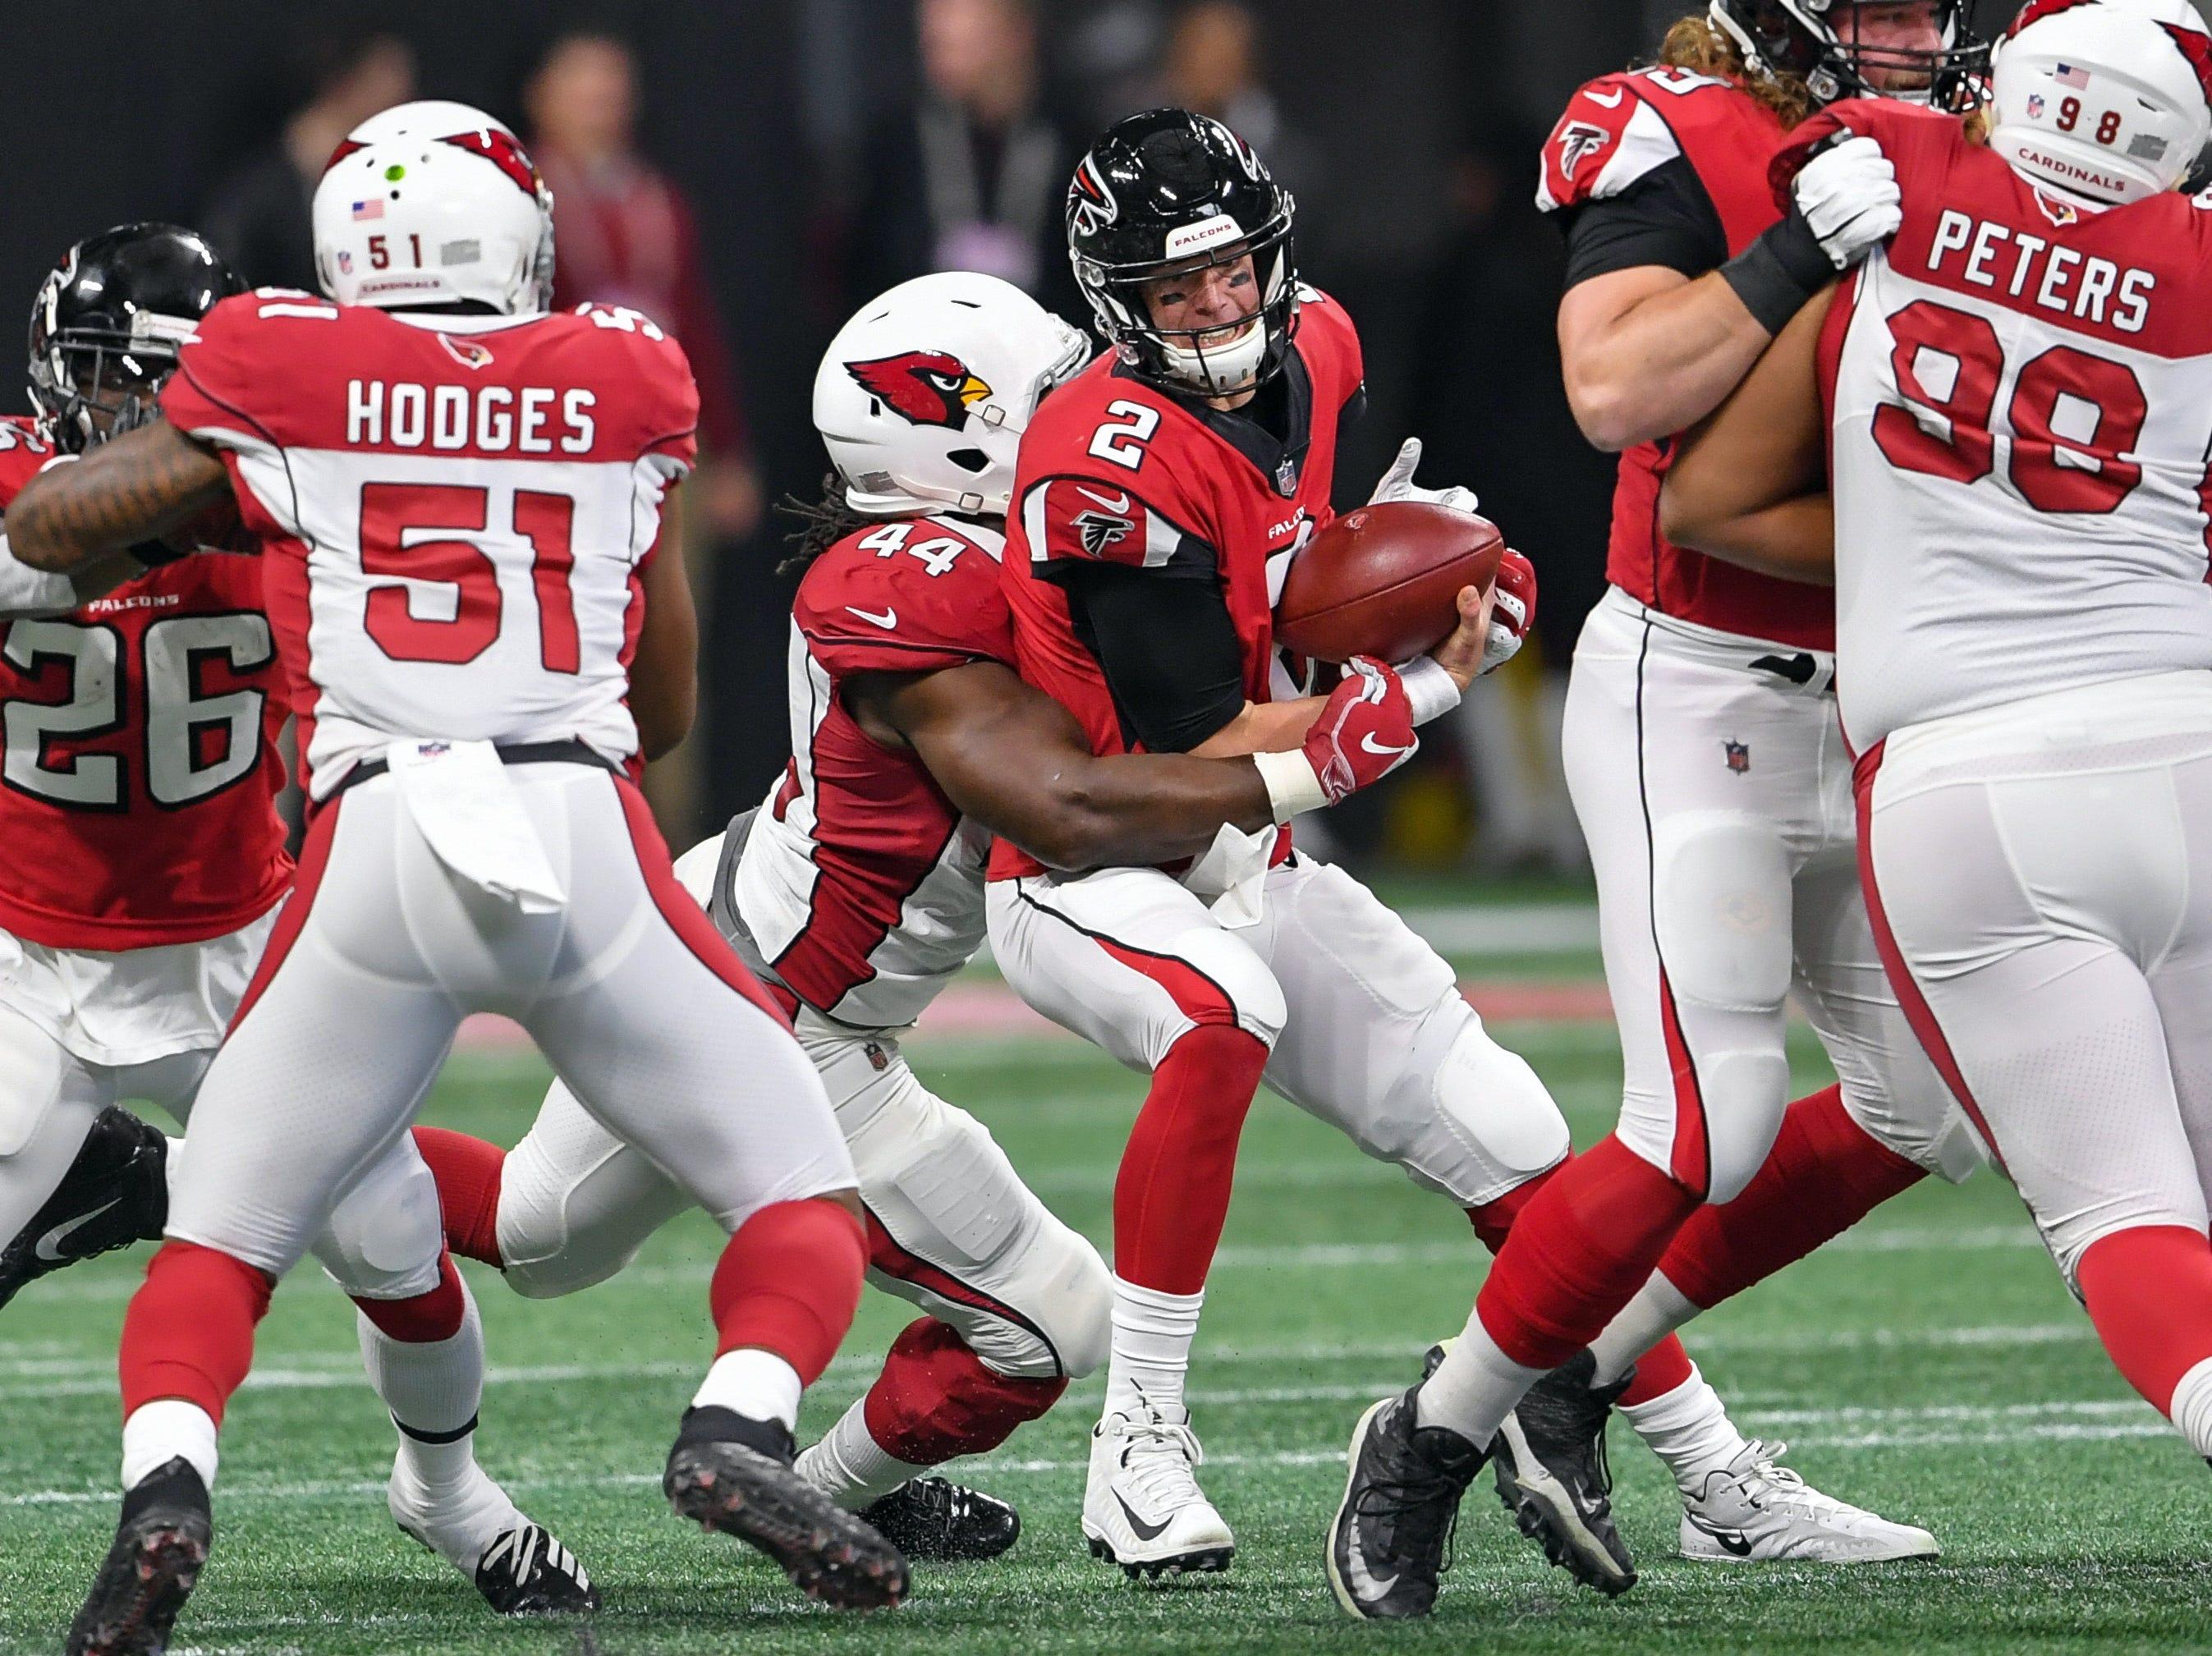 Dec 16, 2018; Atlanta, GA, USA; Atlanta Falcons quarterback Matt Ryan (2) is sacked by Arizona Cardinals defensive end Markus Golden (44) during the first quarter at Mercedes-Benz Stadium.